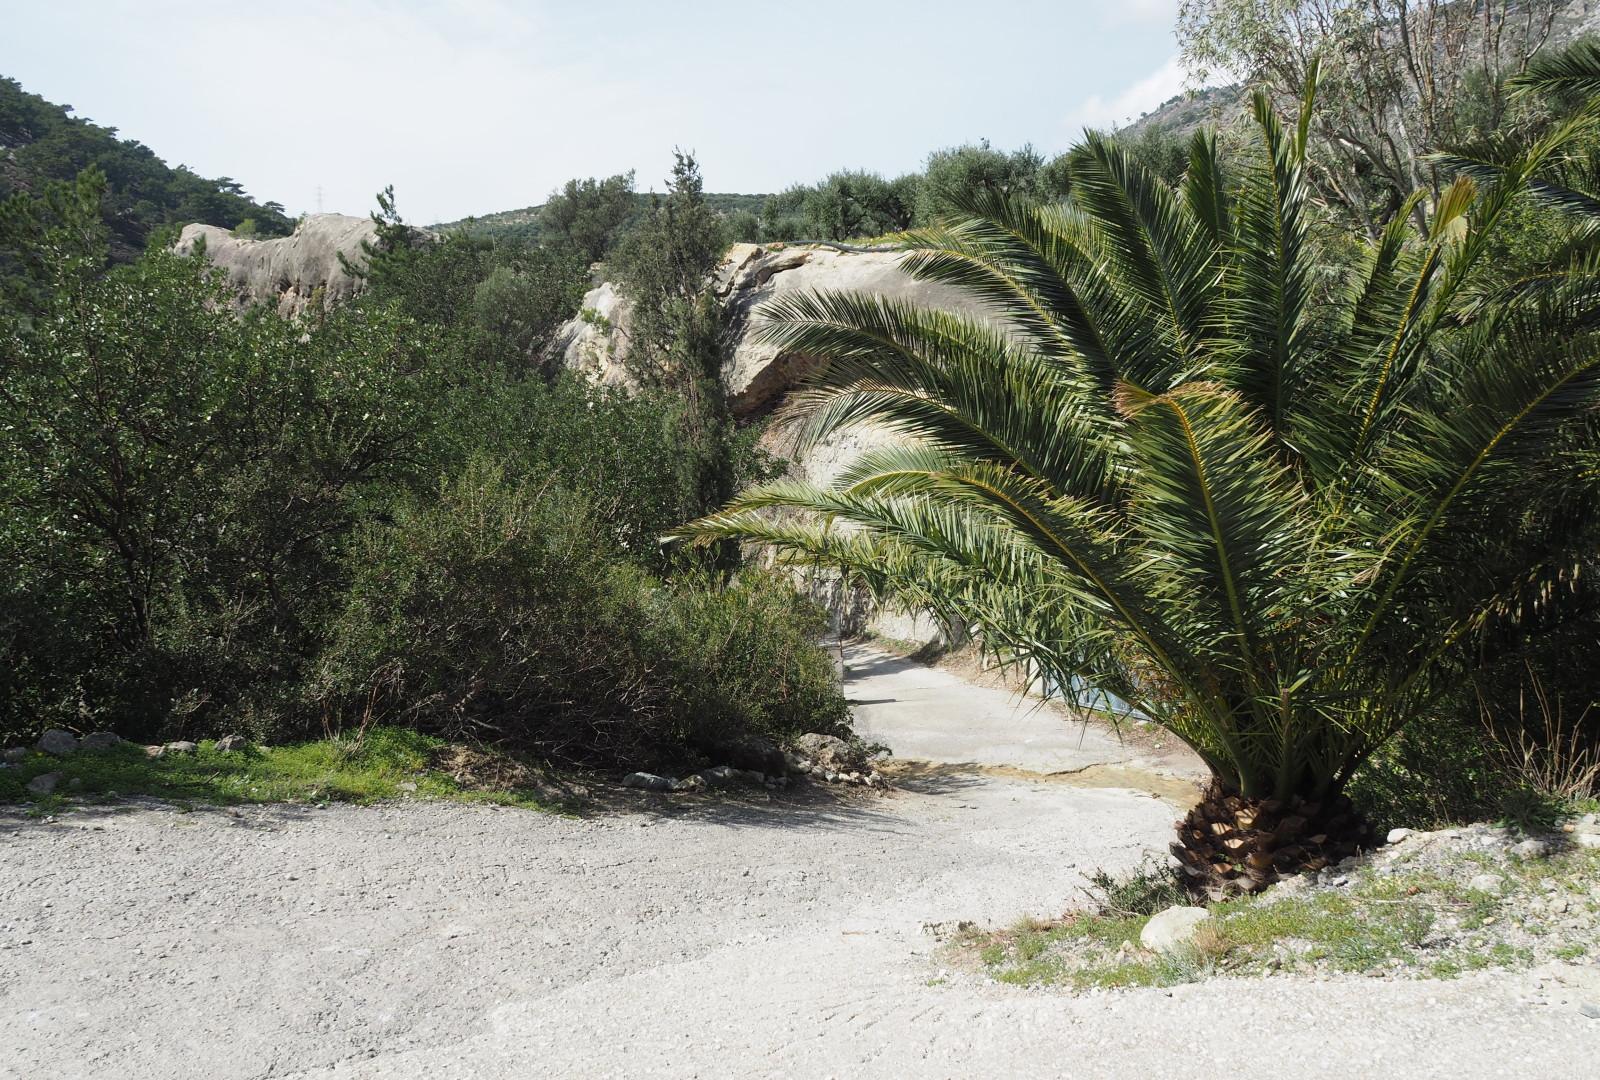 L'entrée, Kalyvitis, Crète